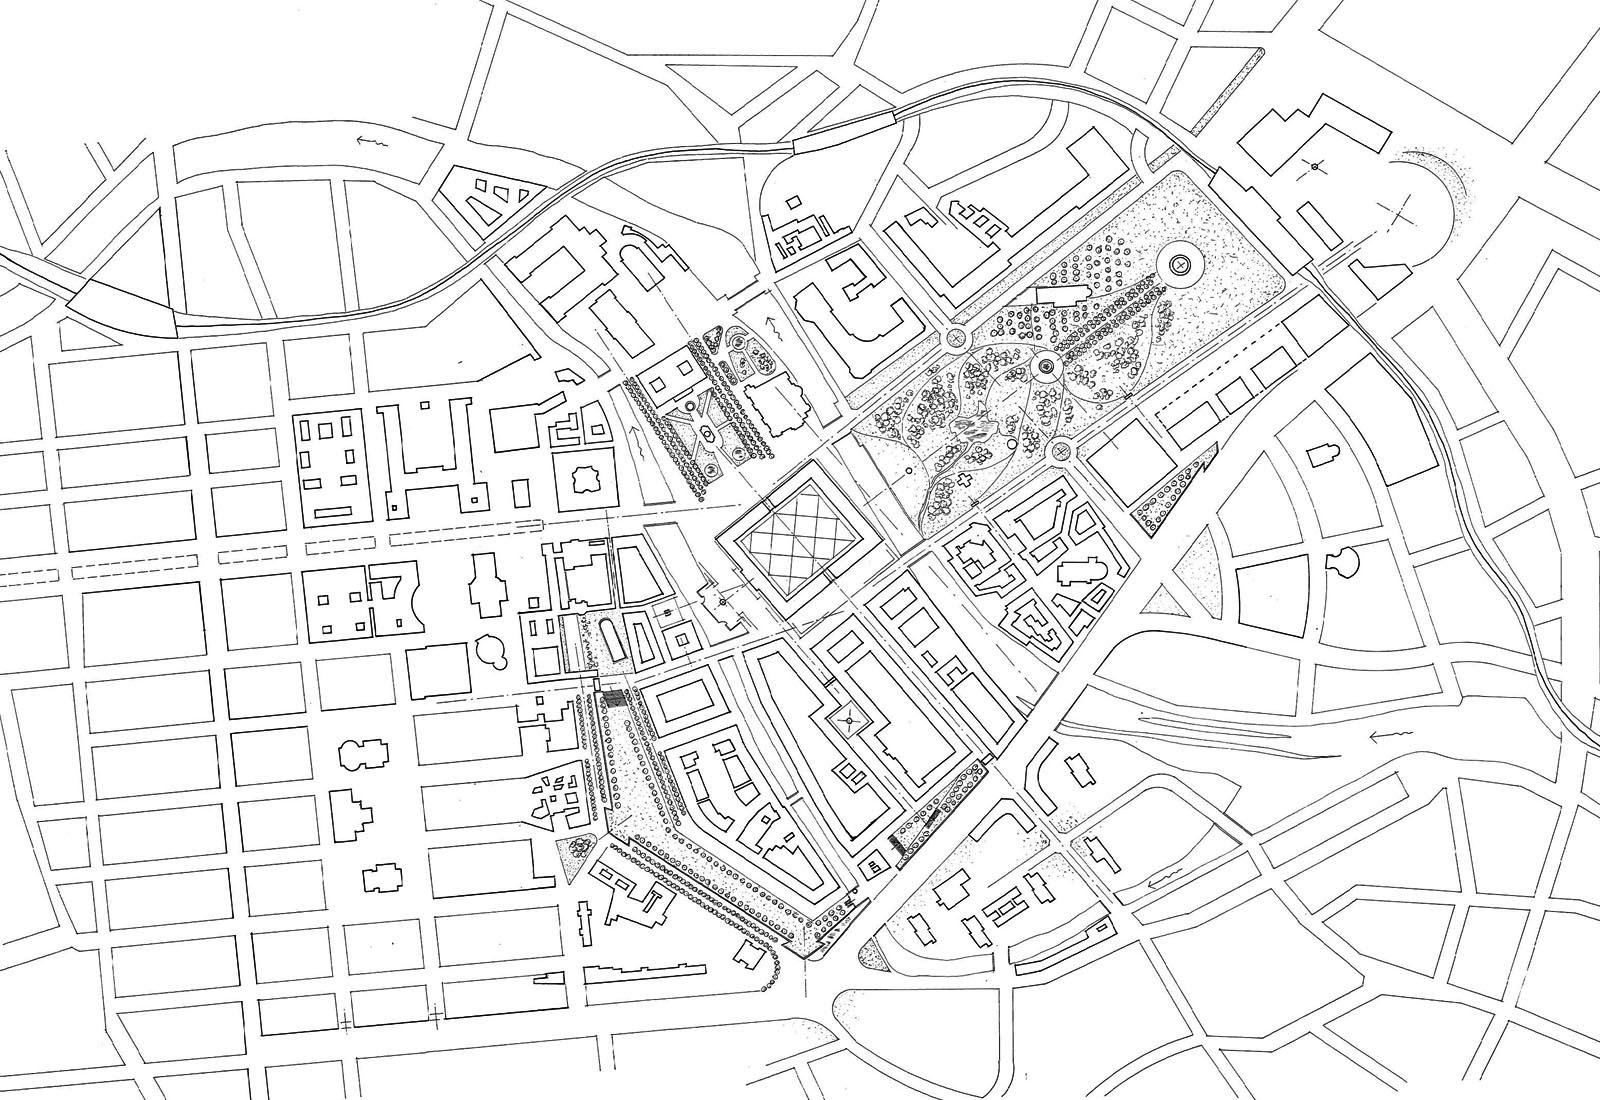 Concorso Spreeinsel Berlino - Vista planimetrica generale